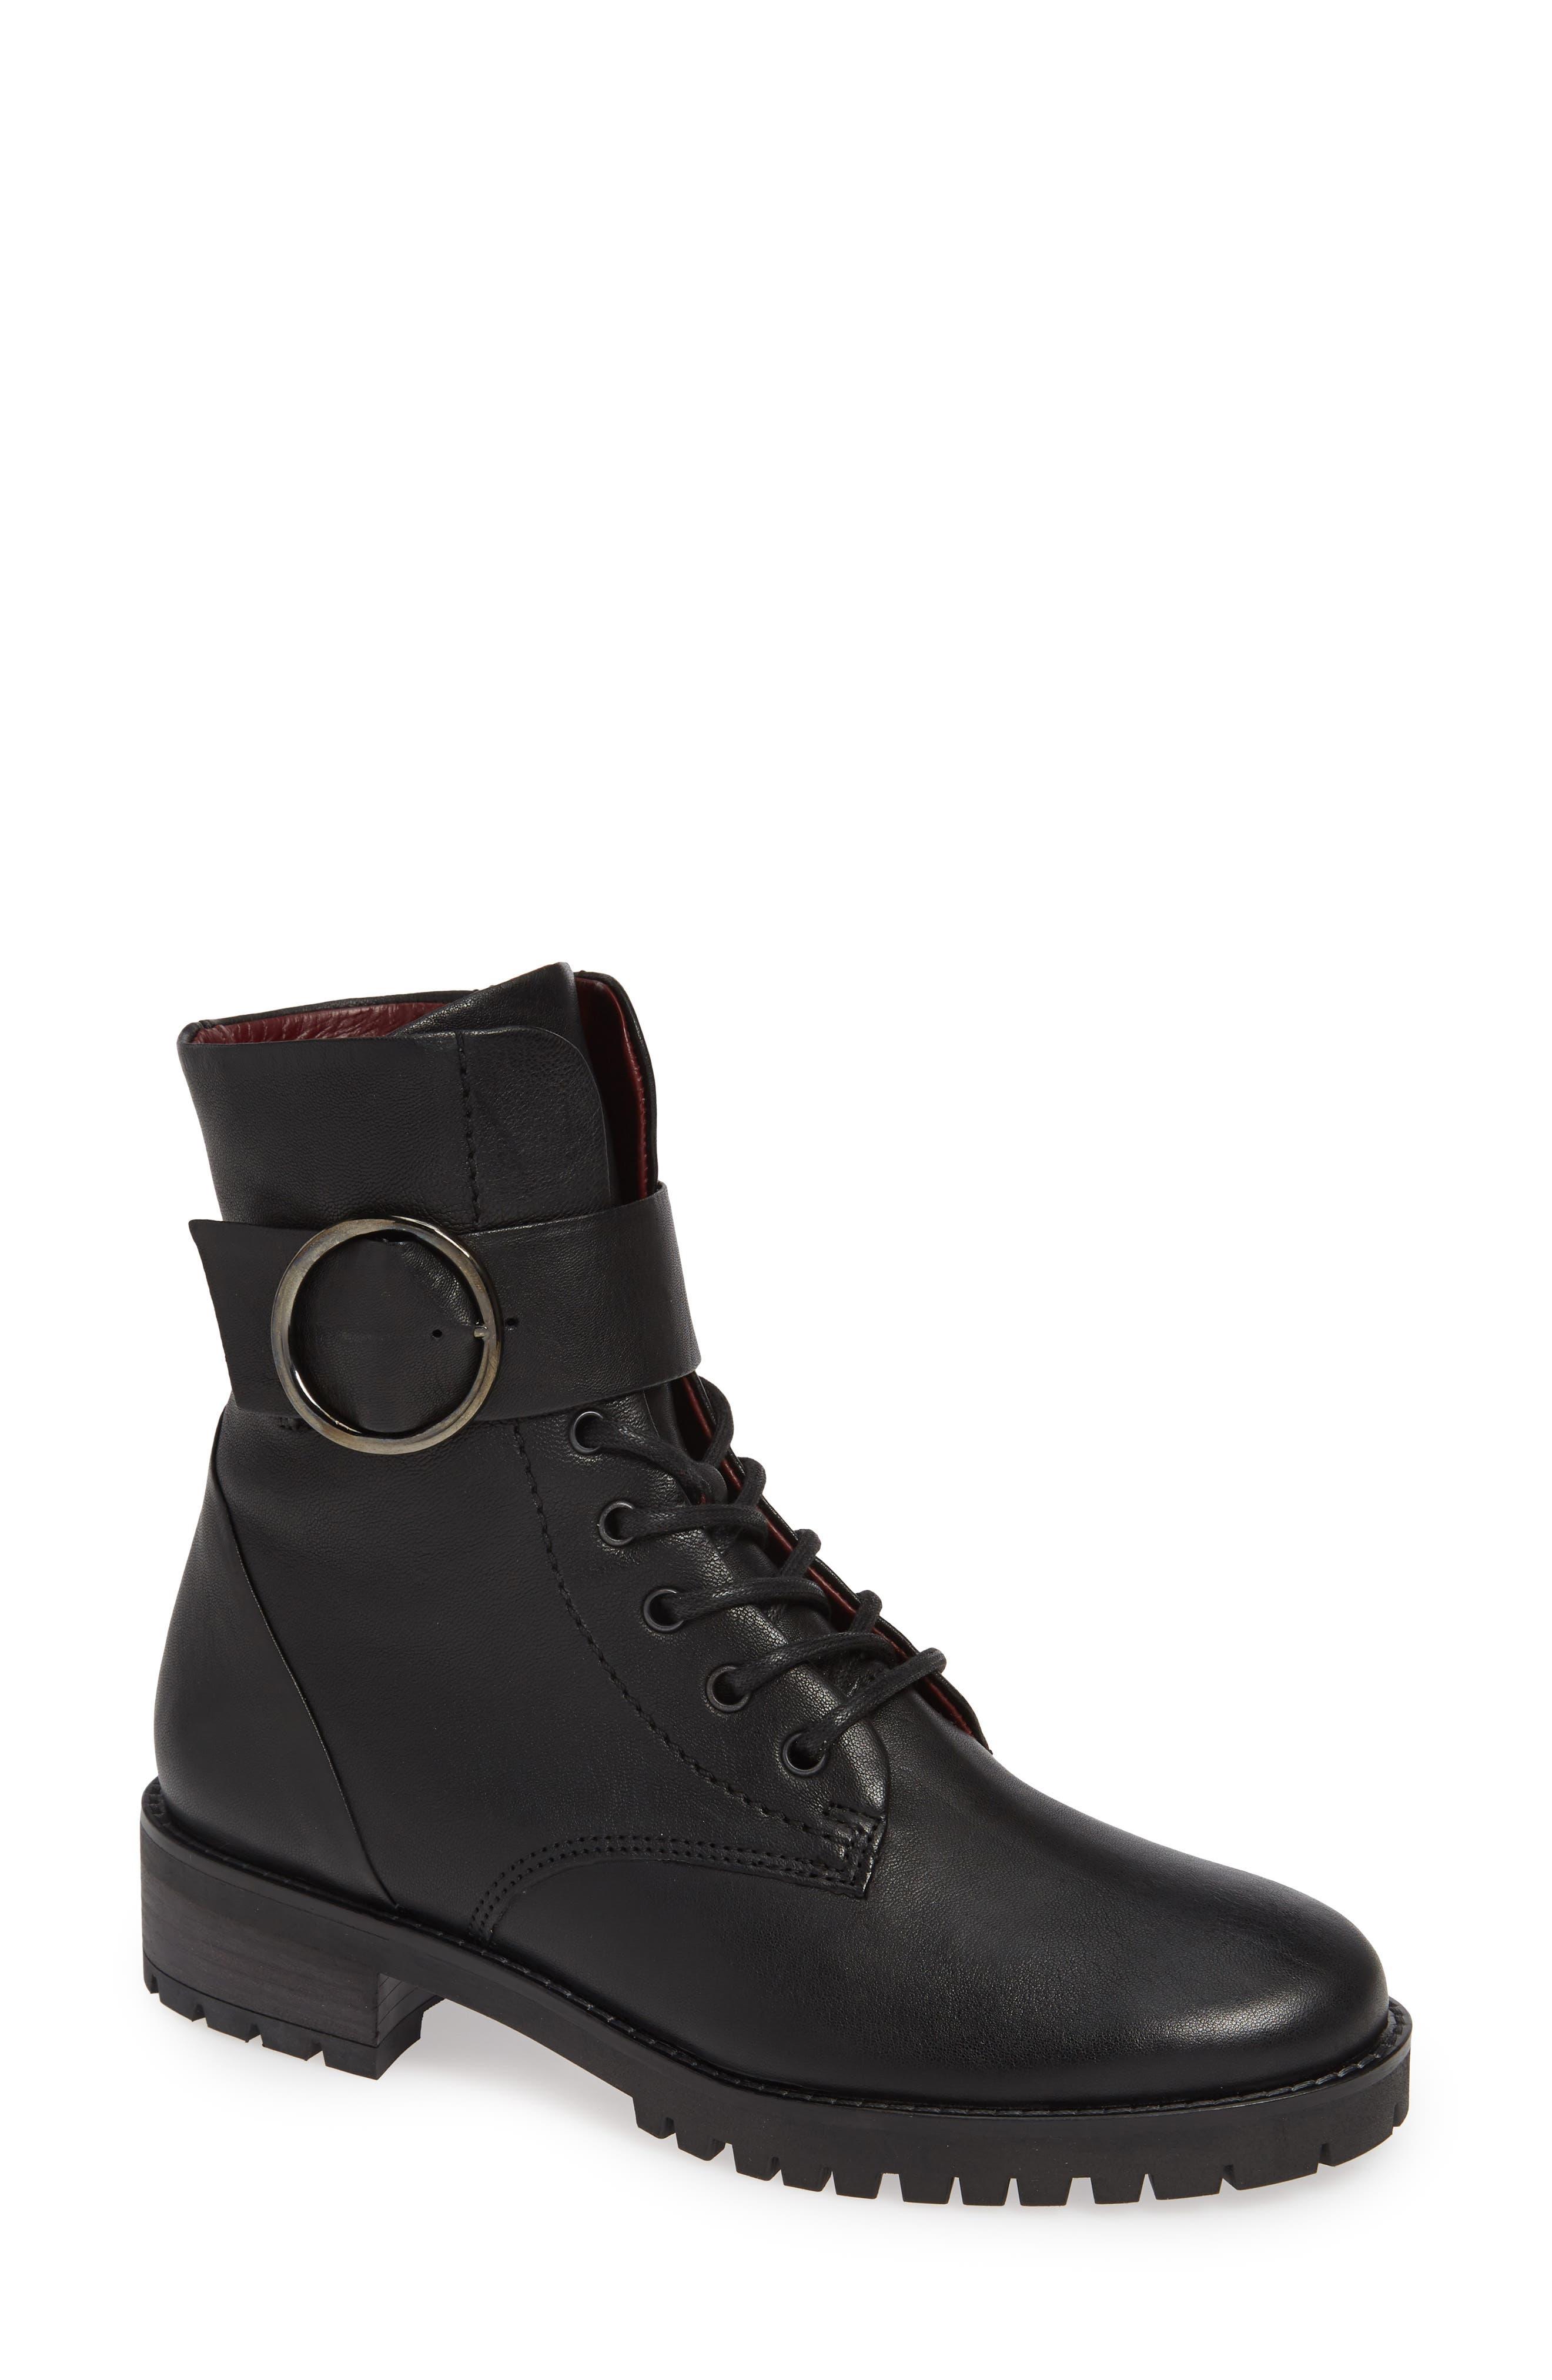 Paul Green Titan Combat Boot - Black